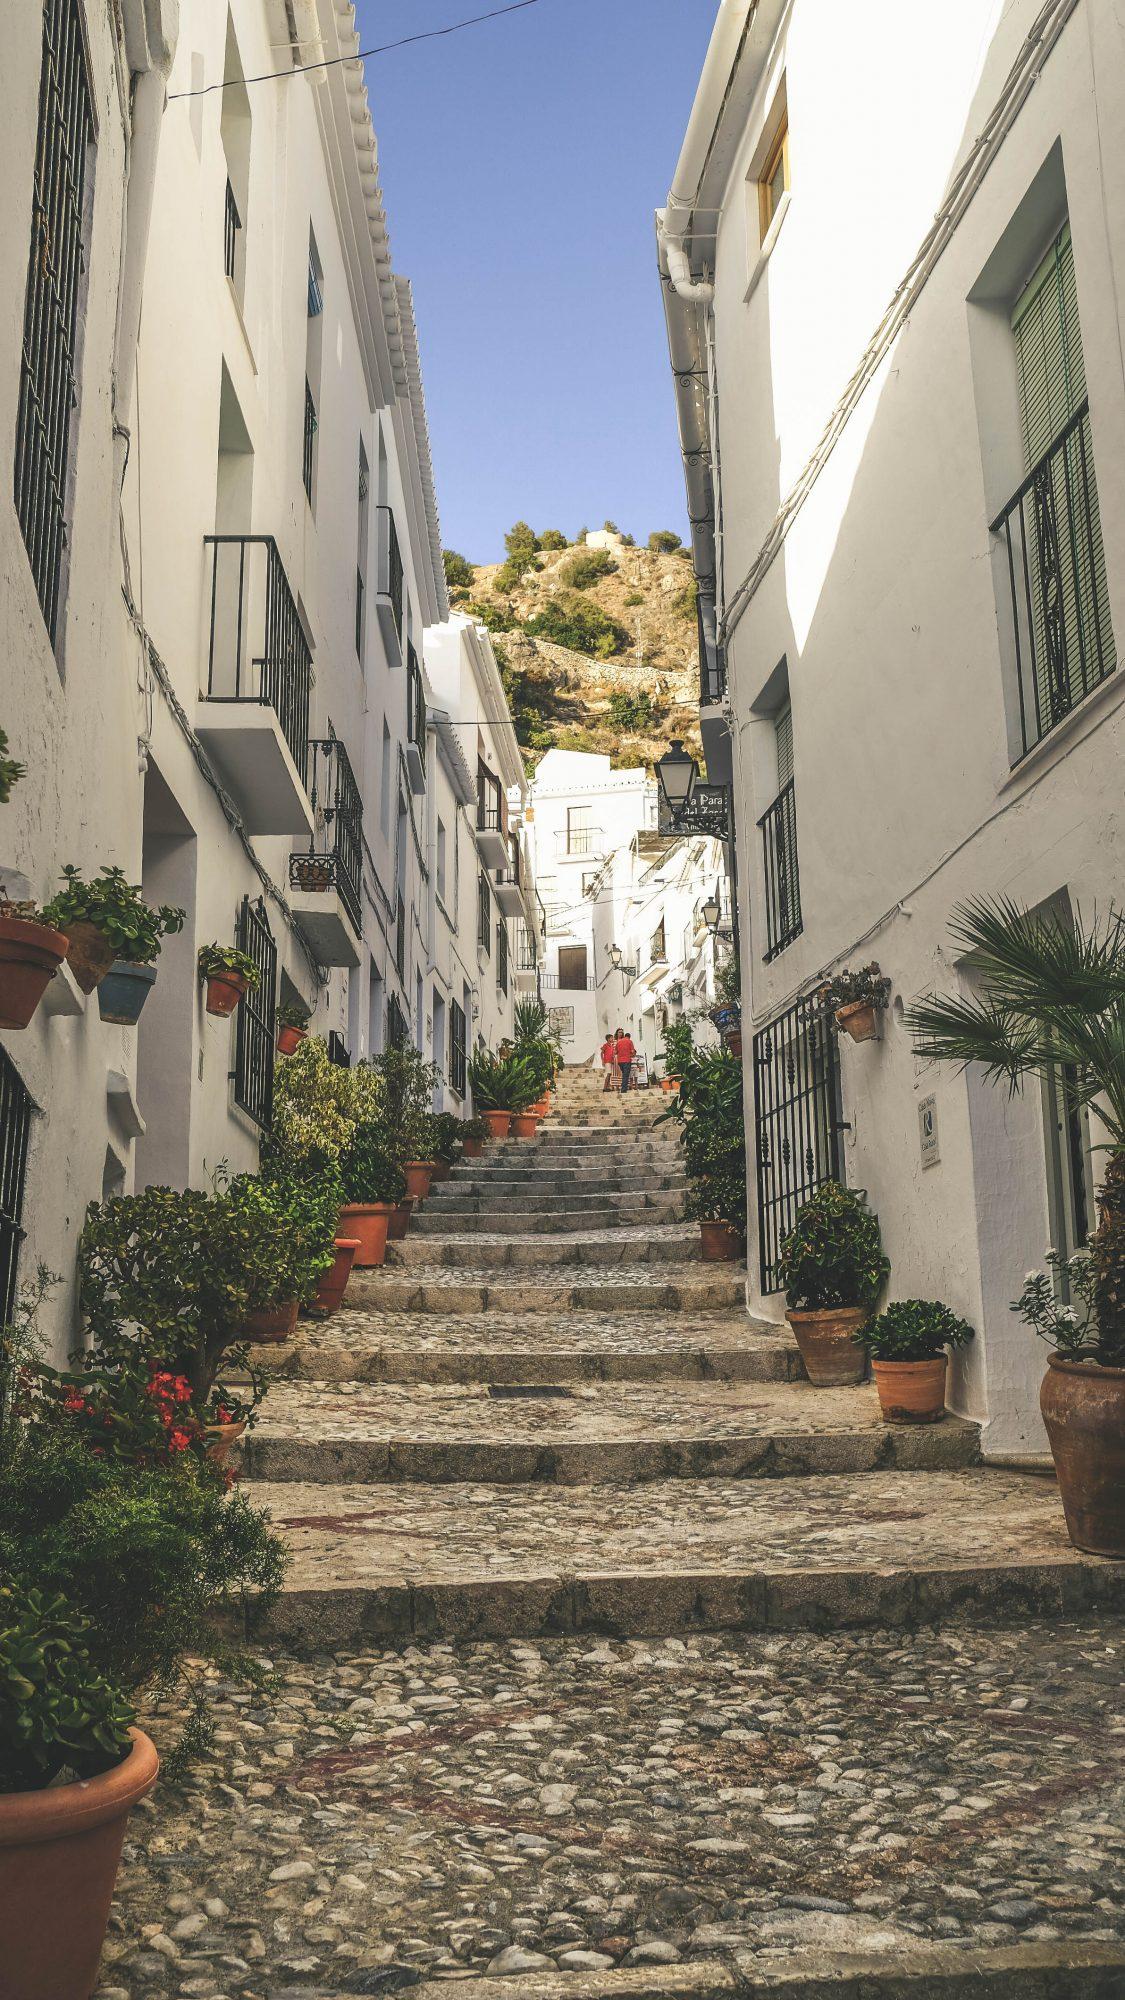 Ruelle fleurie - Frigiliana, Espagne